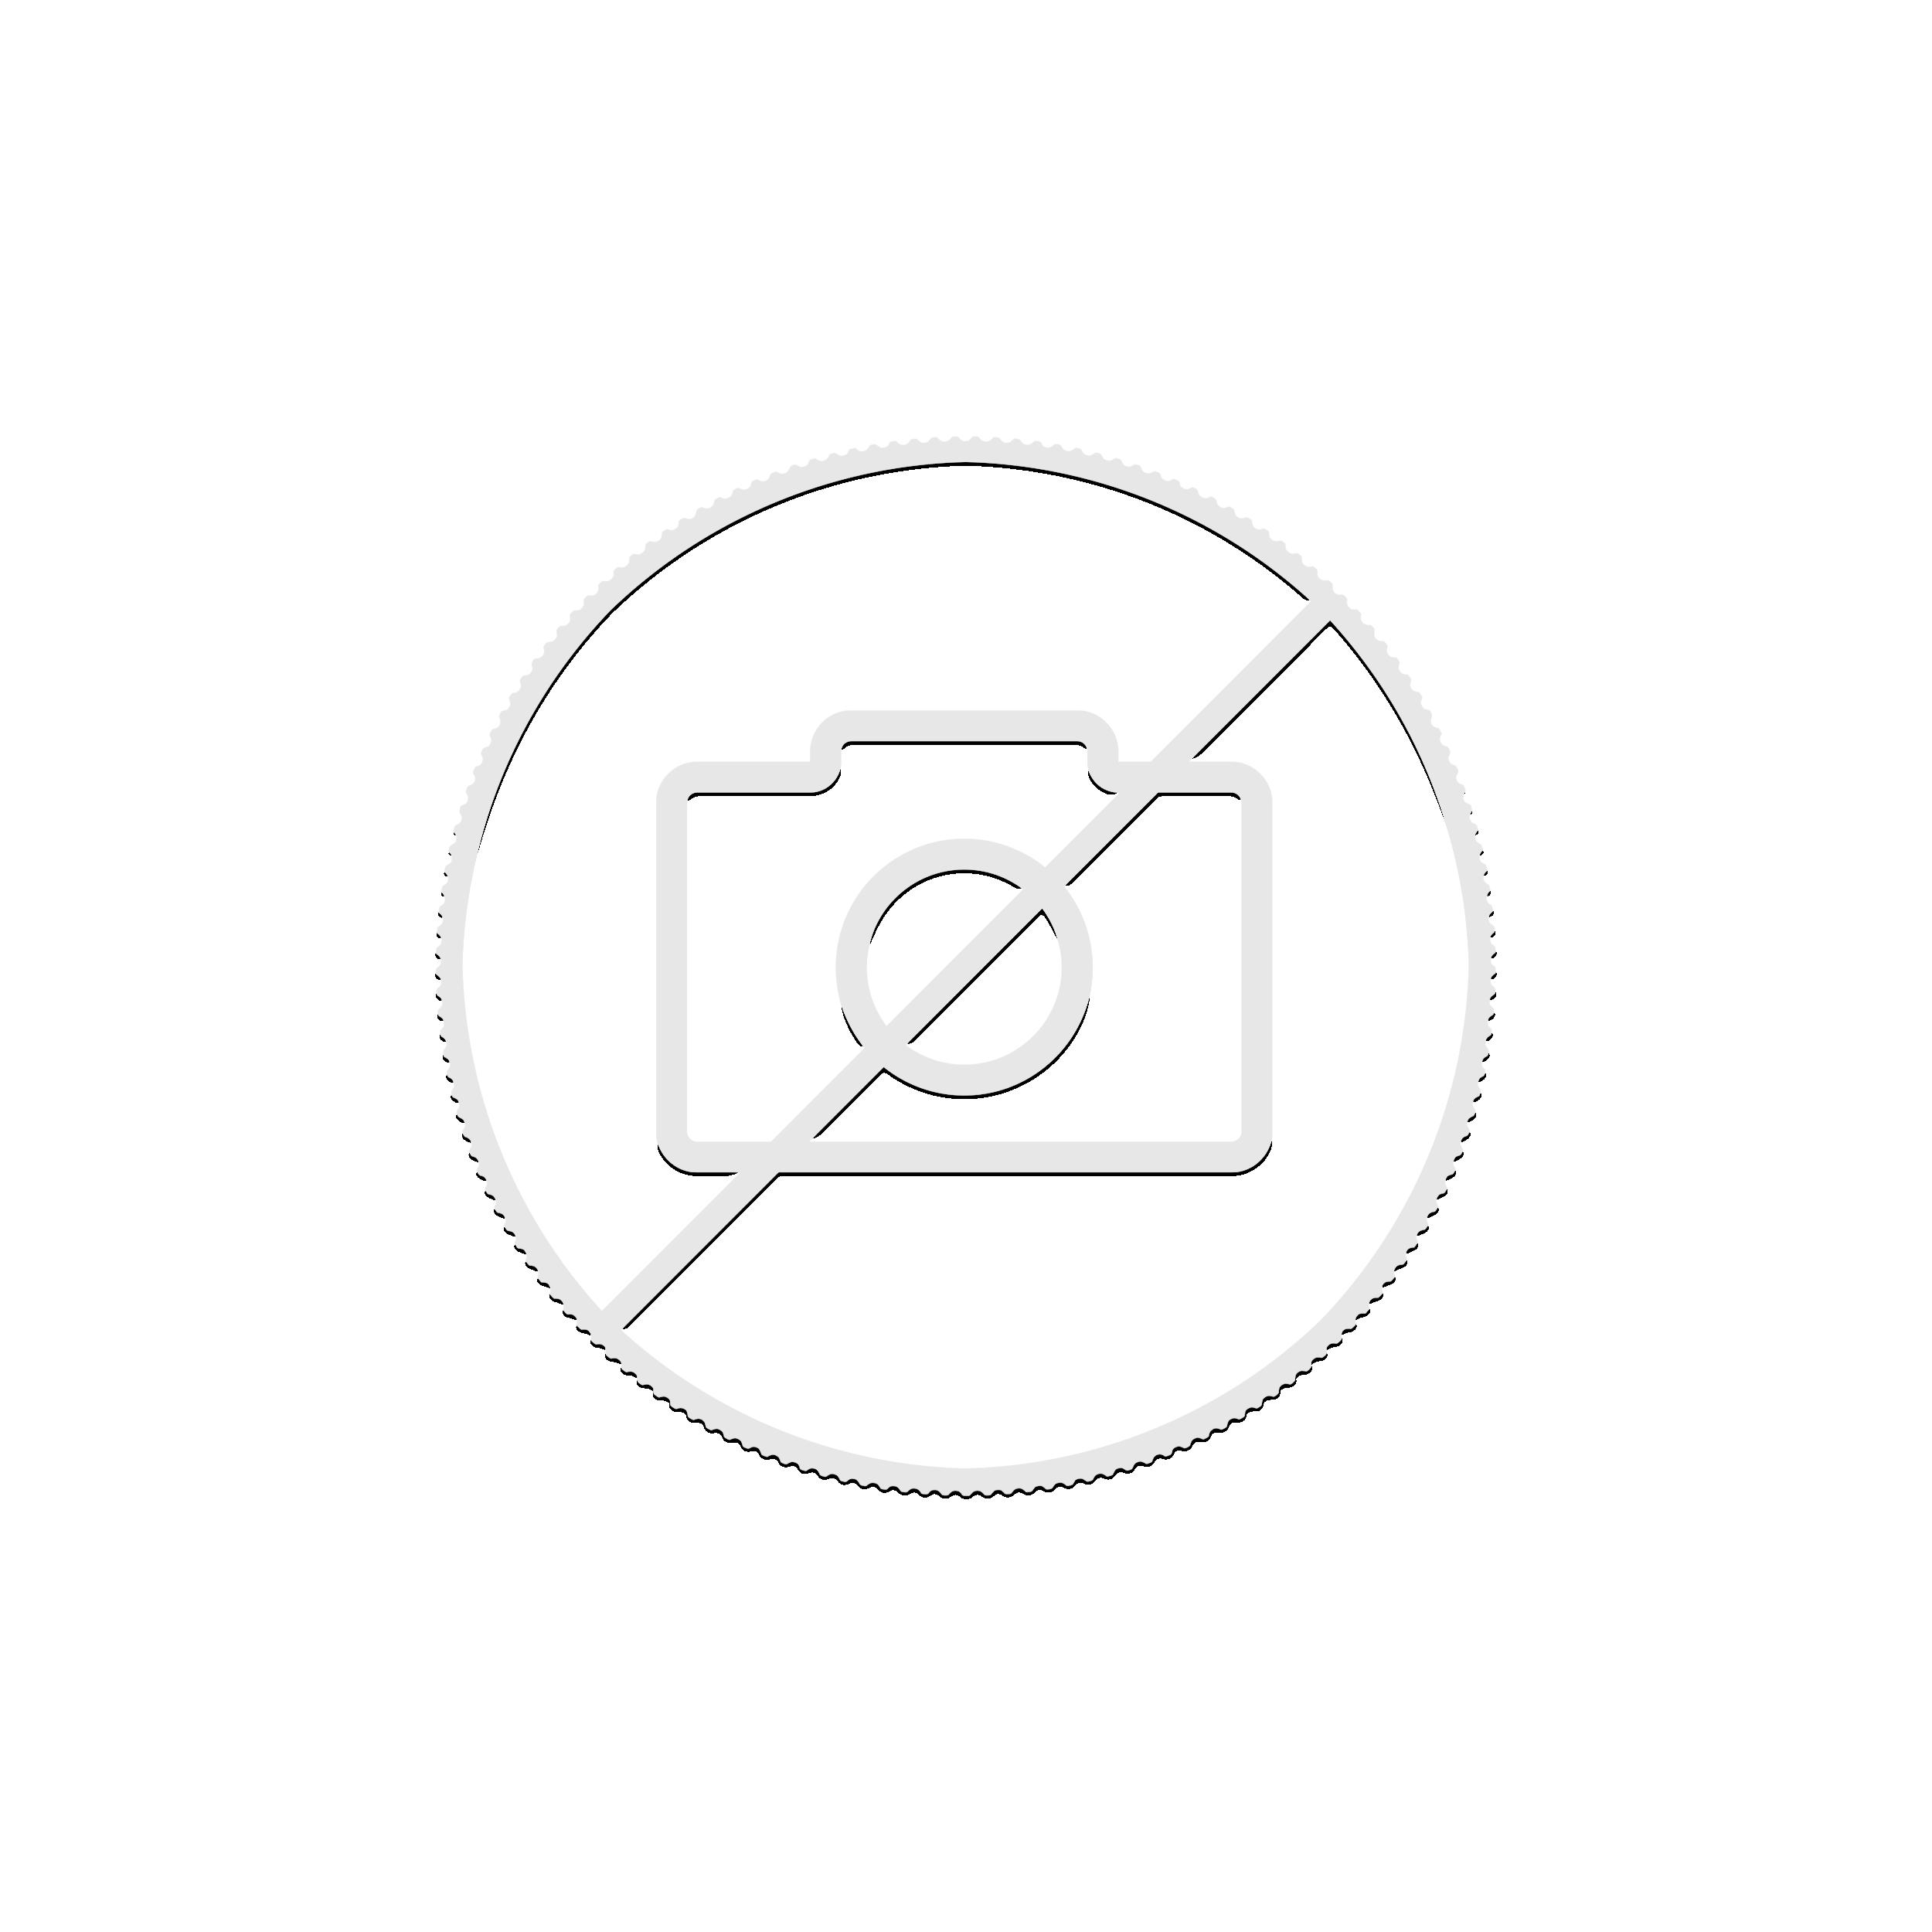 2 Troy ounce zilveren munt Ancient Egypt 2019